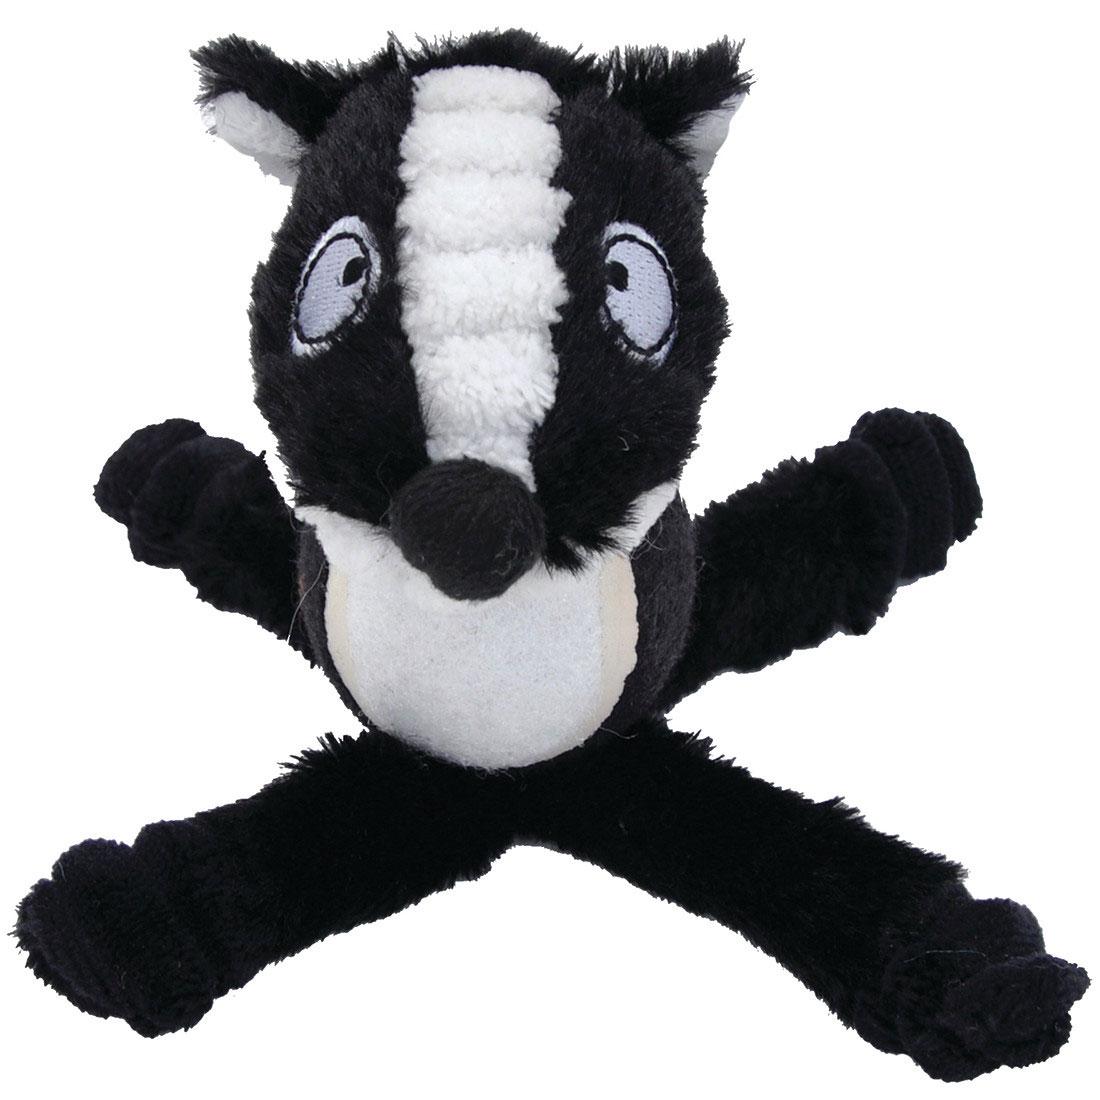 Li'l Pals Tennis Ball Skunk Plush Dog Toy, 6-in